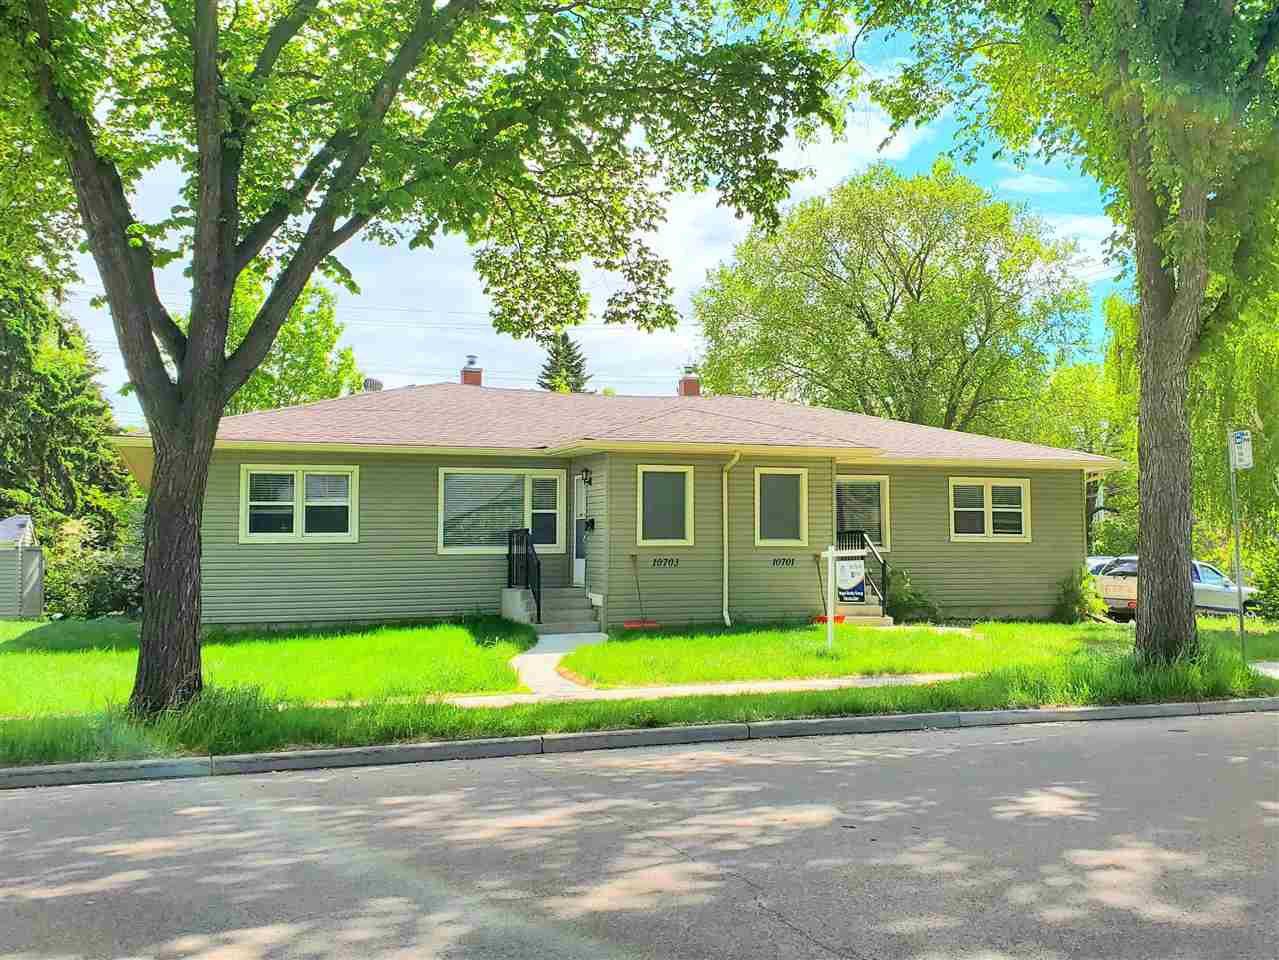 Main Photo: 10701 - 10703 135 Street in Edmonton: Zone 07 House Duplex for sale : MLS®# E4190600